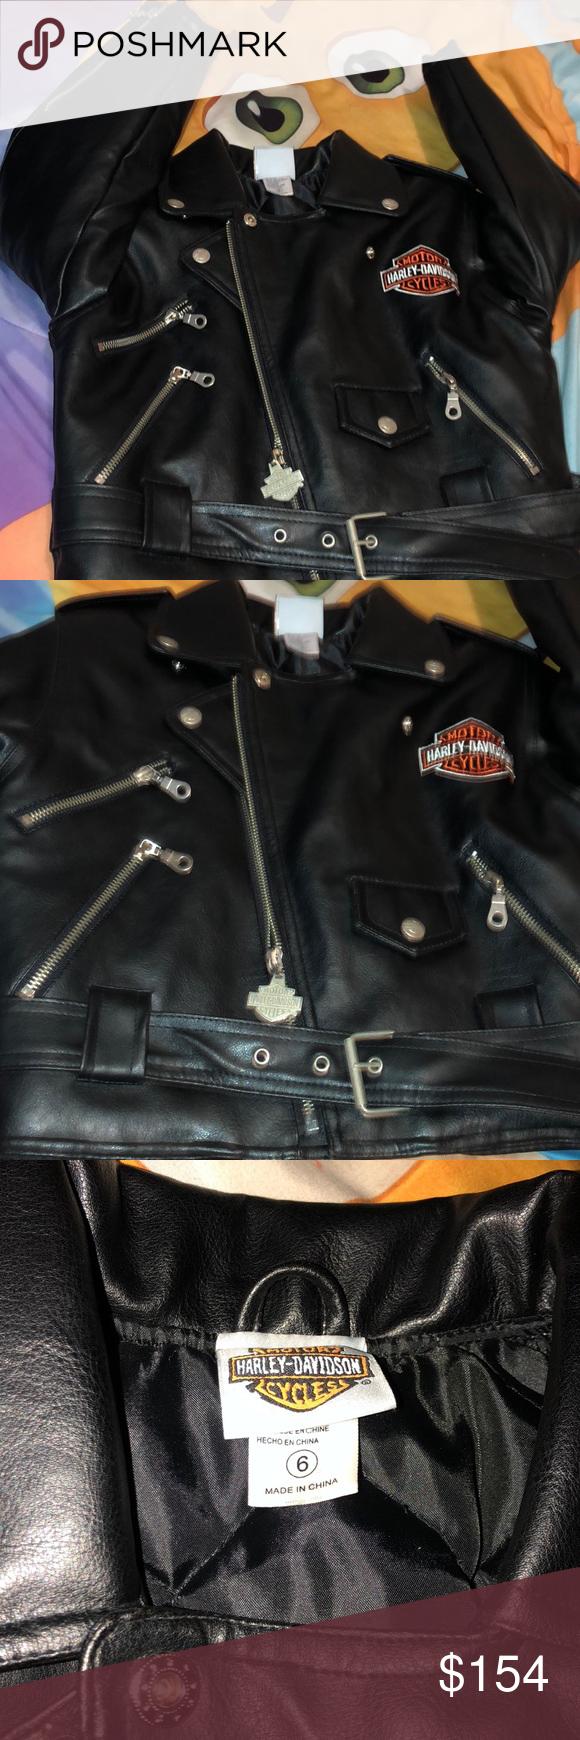 Harley Davidson Leather Jacket Harley Davidson Leather Jackets Leather Jacket Kids Leather Jackets [ 1740 x 580 Pixel ]